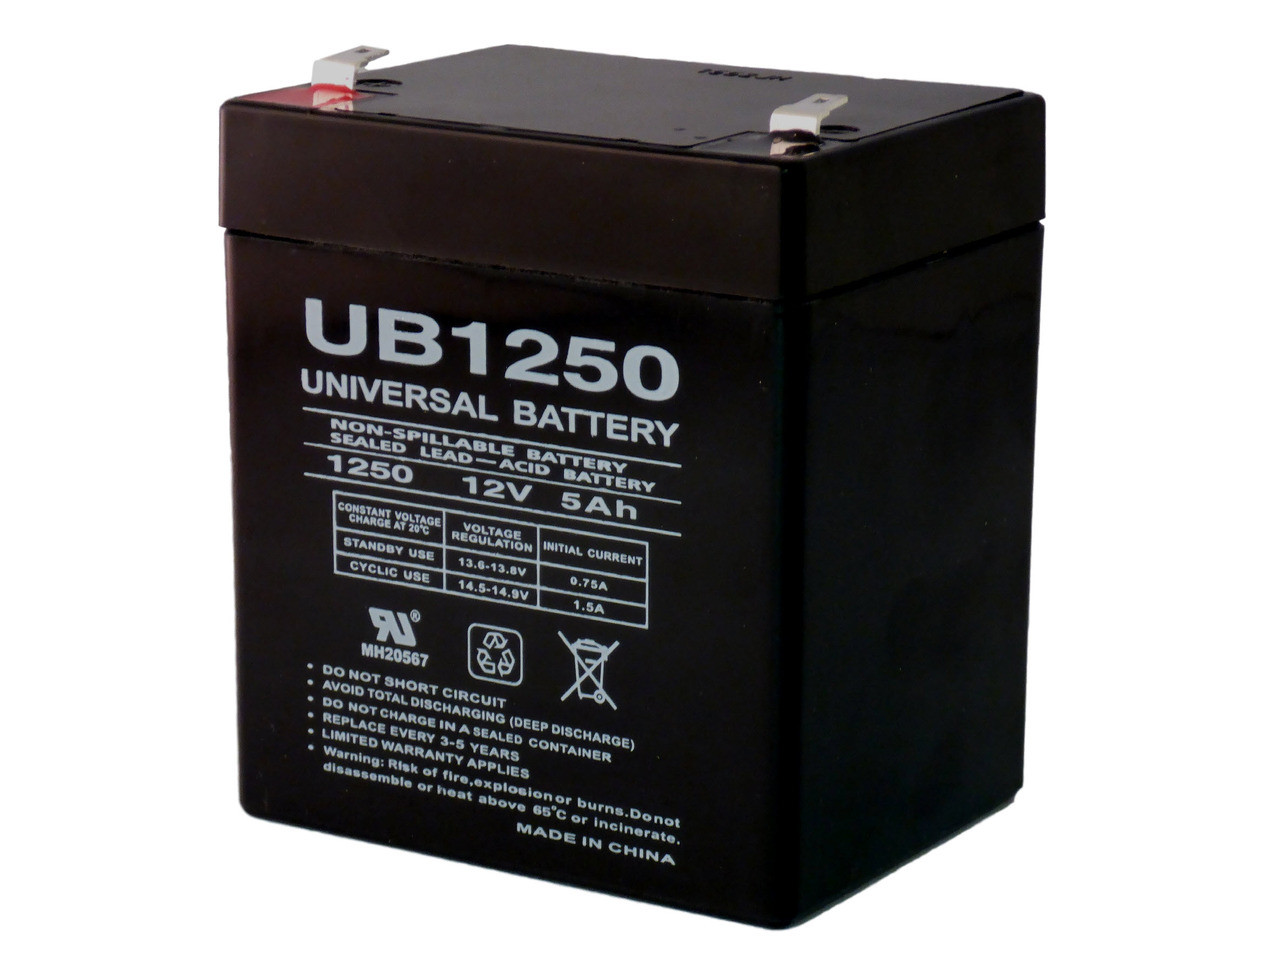 Battery Replaces Access Battery SLA1250 SLA 12V 5Ah F1 Sealed Lead Acid